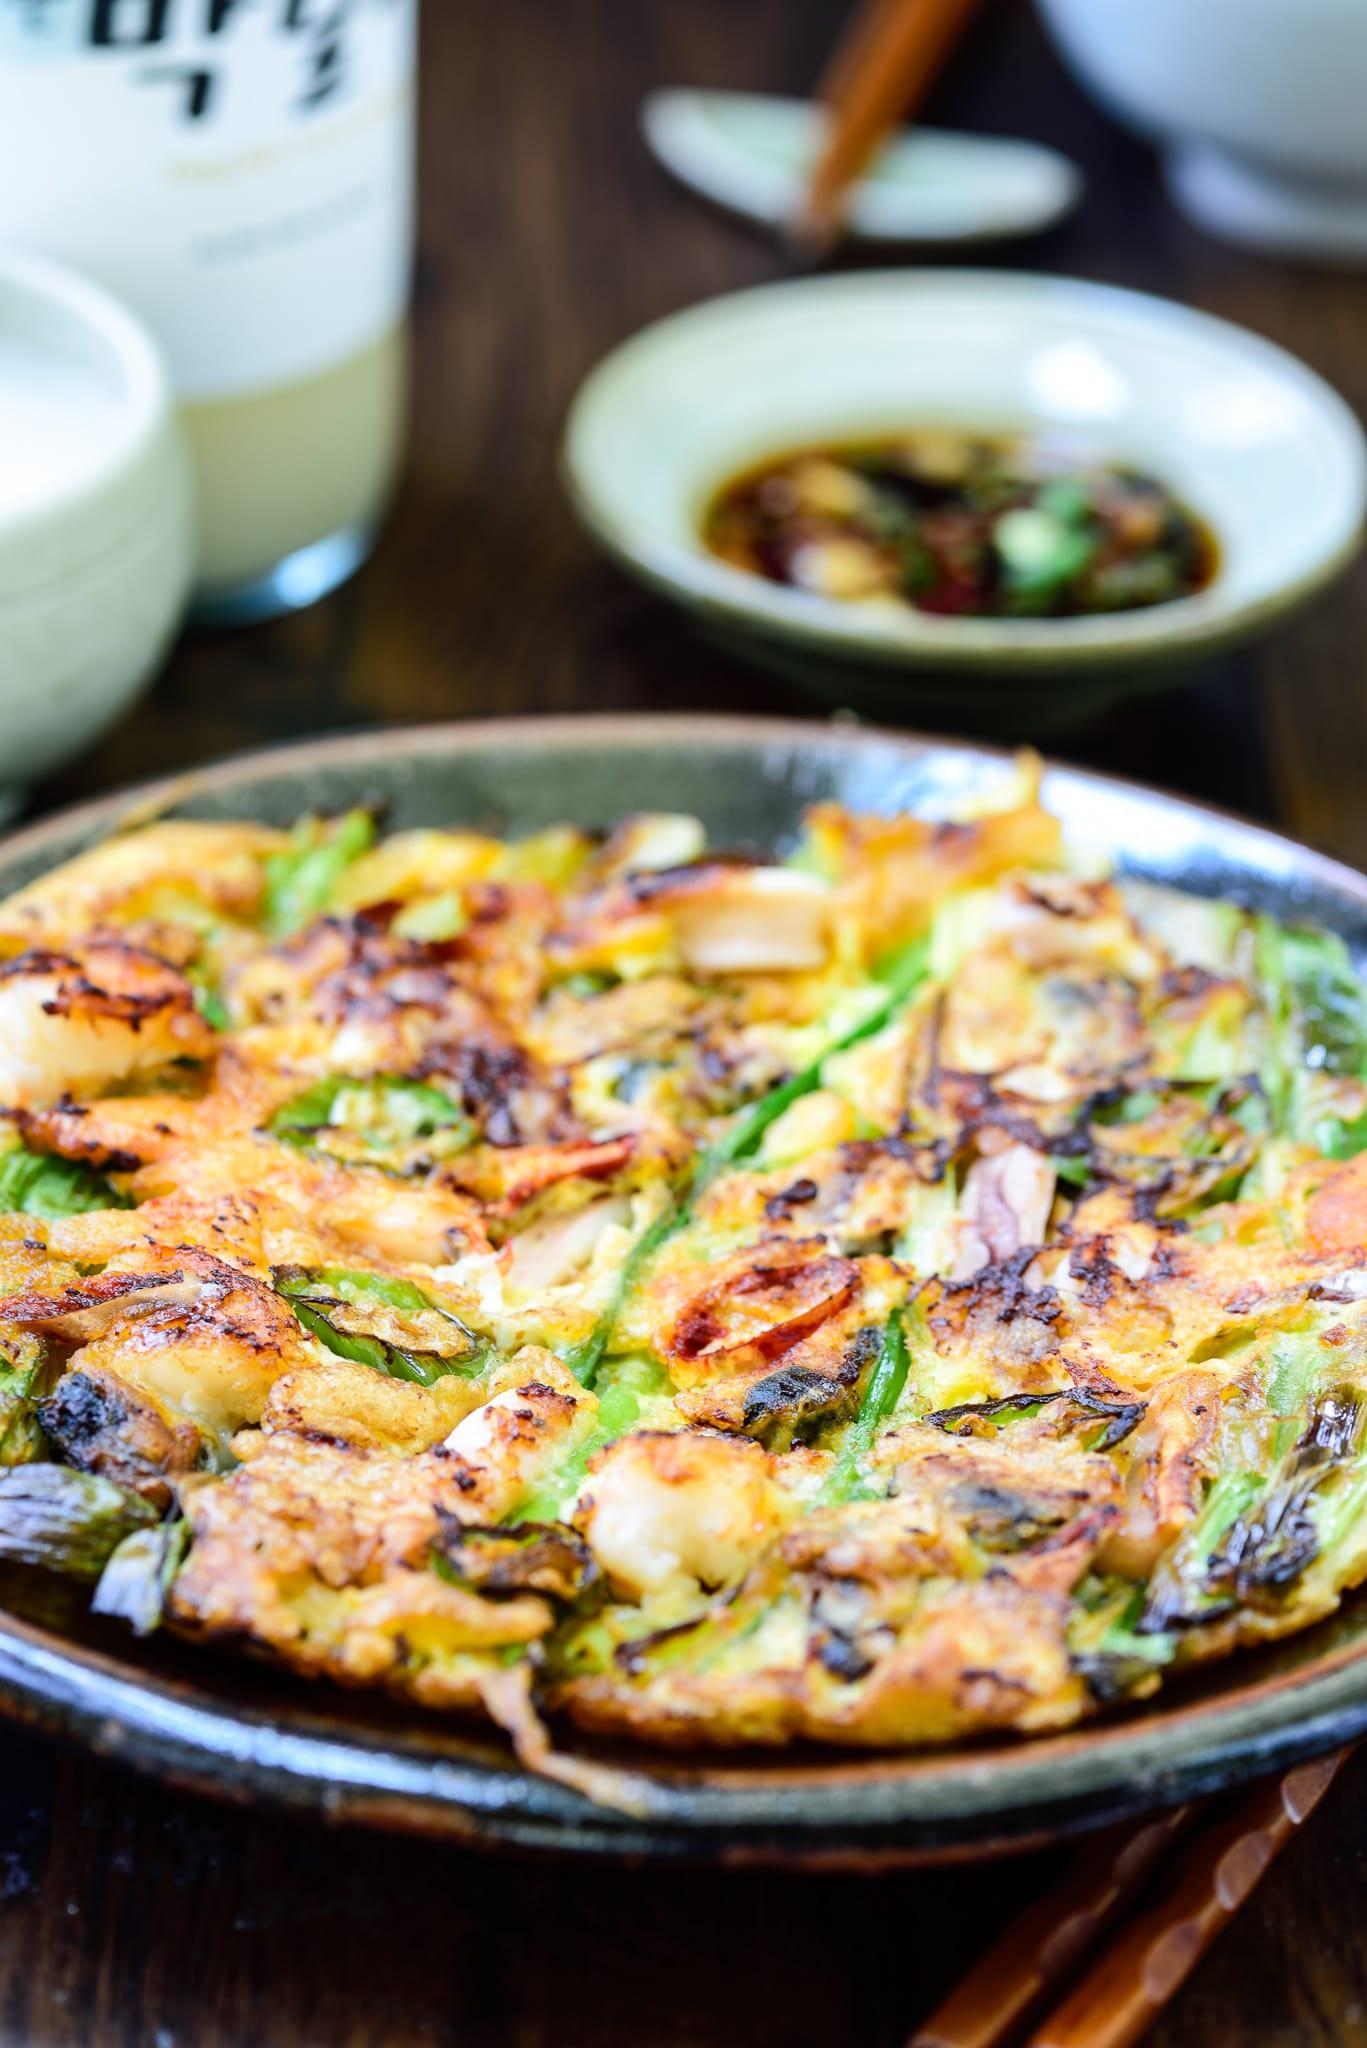 DSC3431 4 - Haemul Pajeon (Seafood Scallion Pancake)